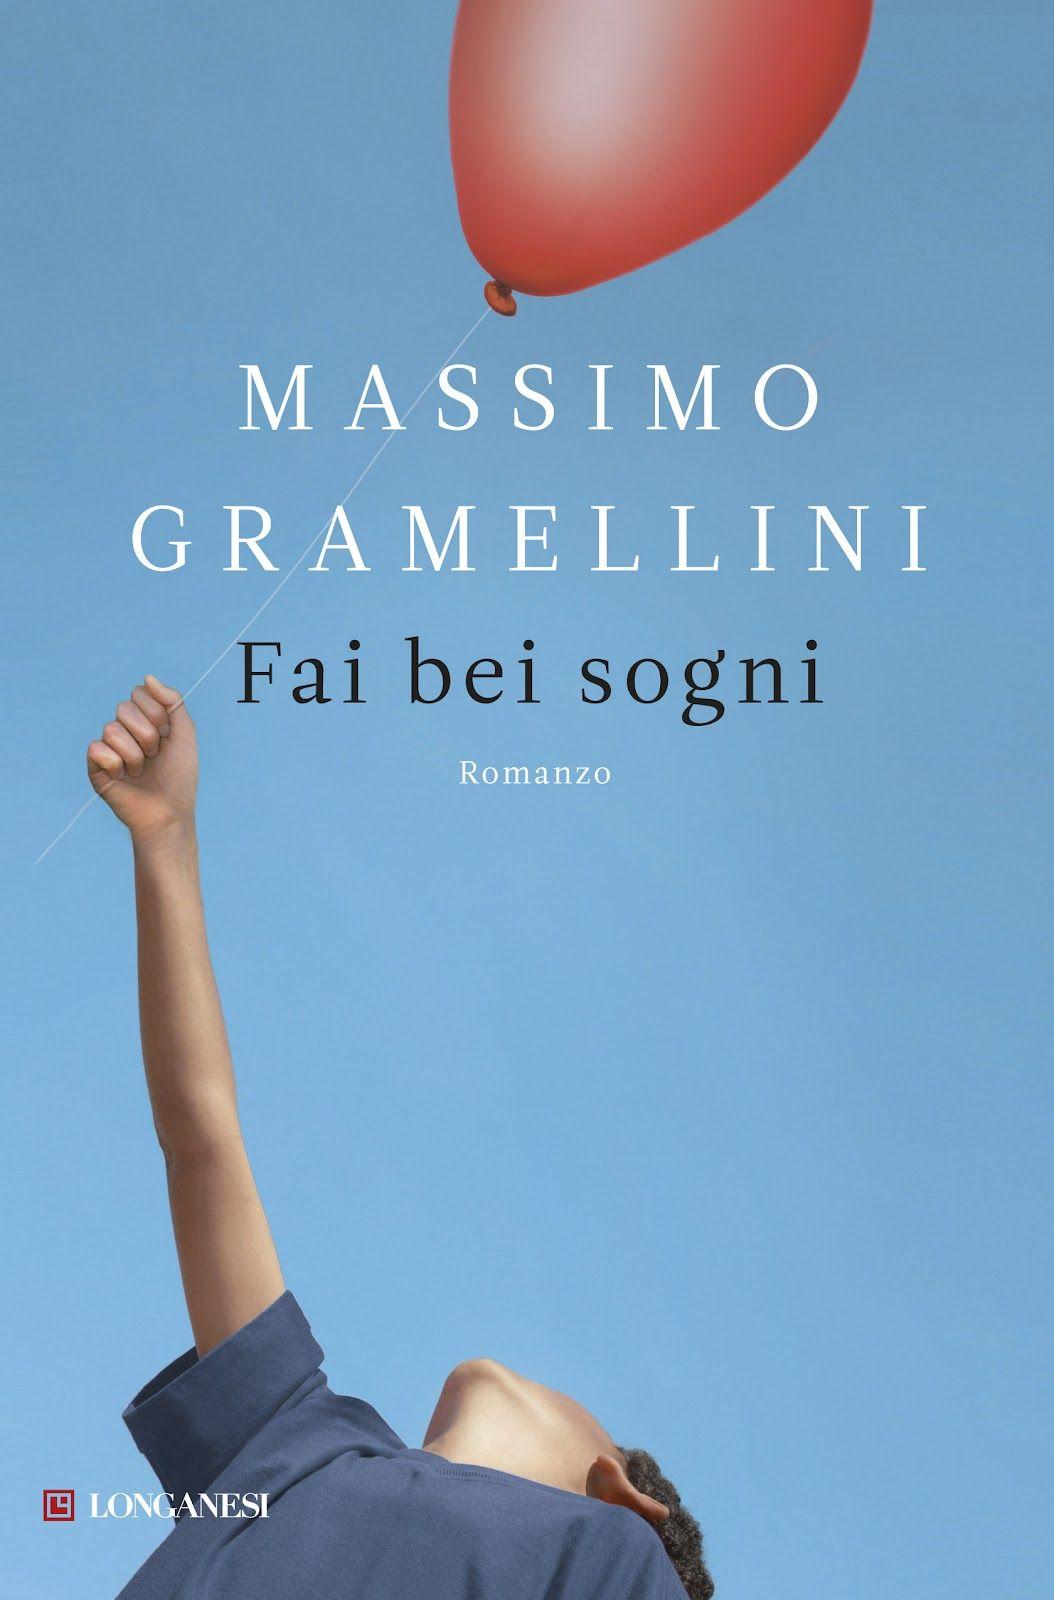 Resultado de imagen de gramellini fai bei sogni